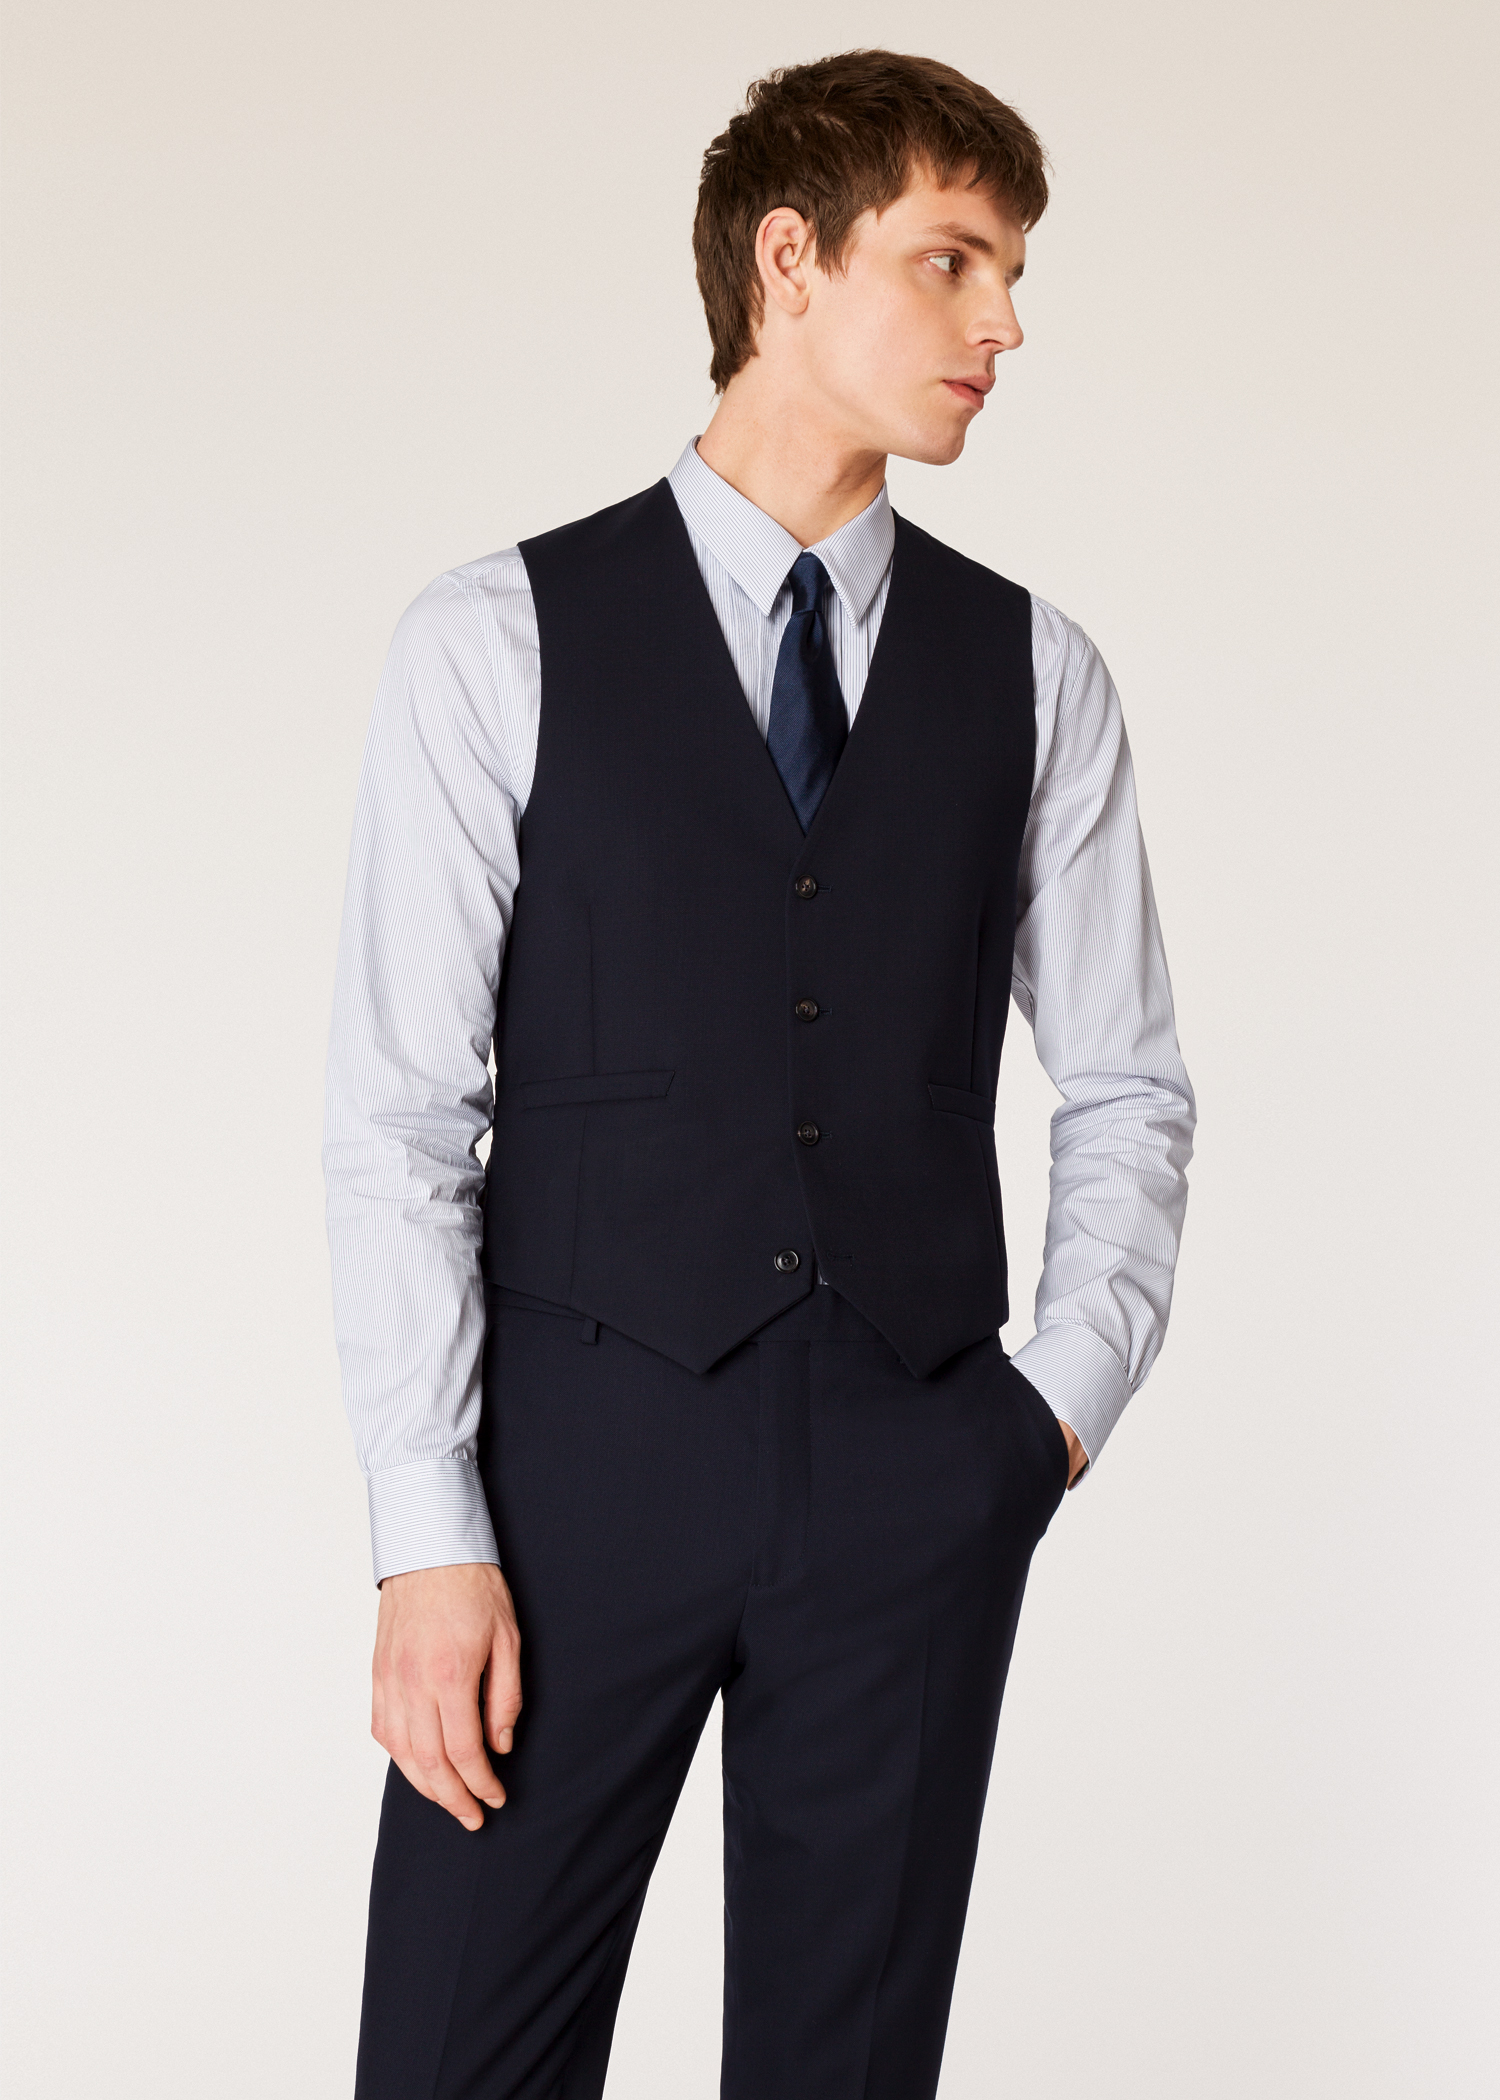 Gilet De Costume Paul Smith Homme  A Suit To Travel In  Bleu Marine ... 7f92208f1d0